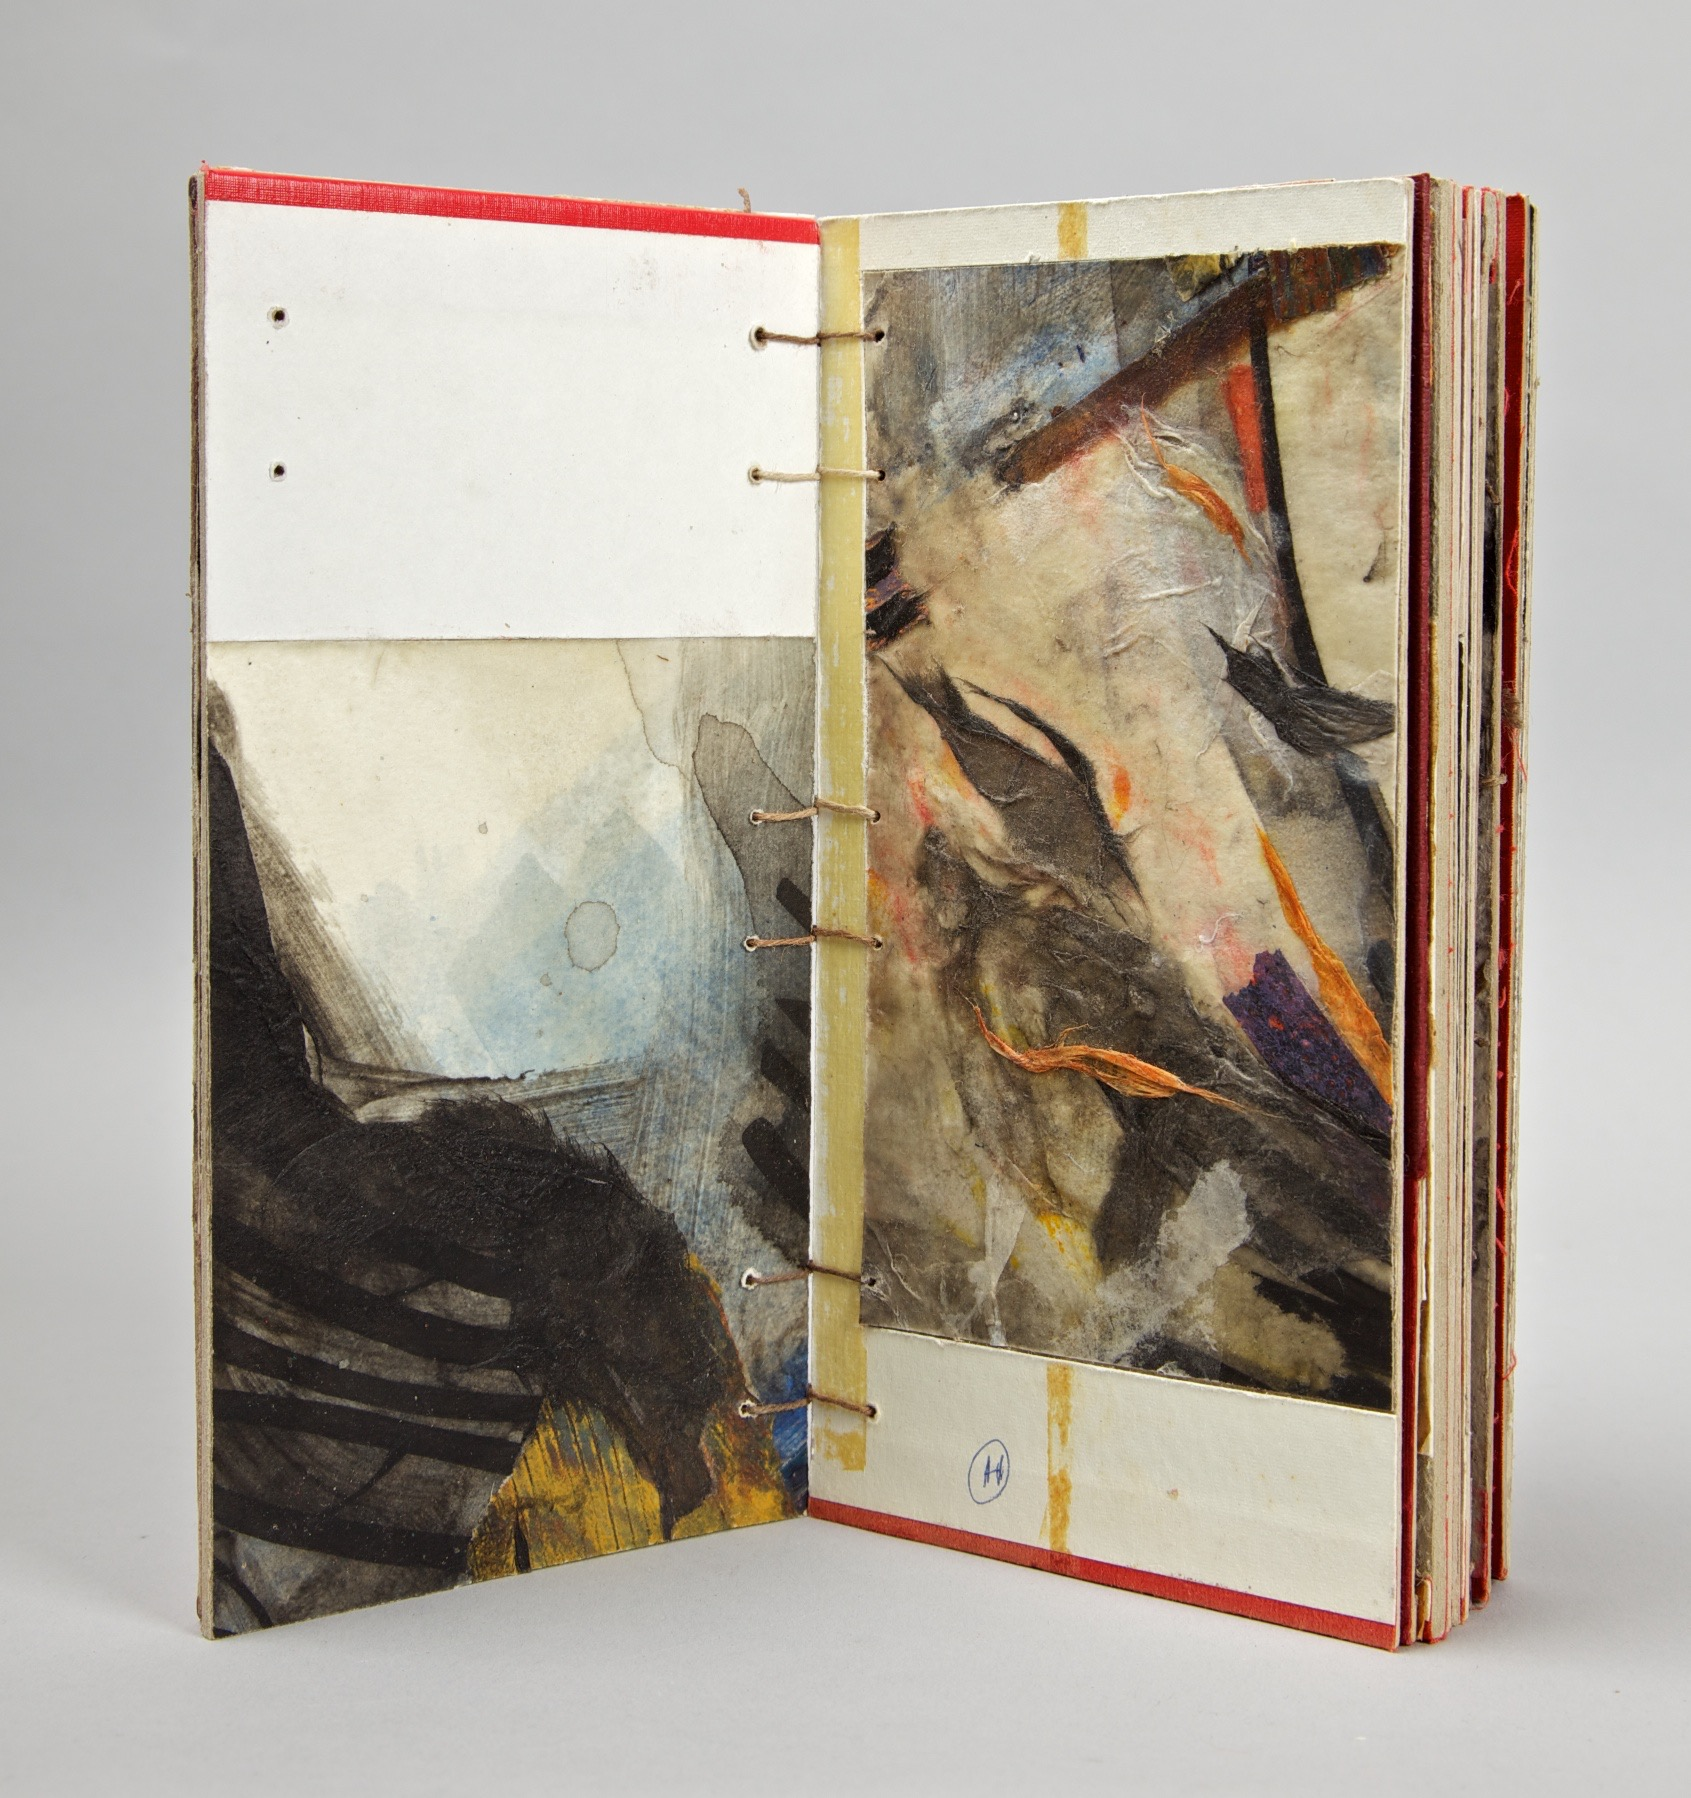 Coptic-bound cover book